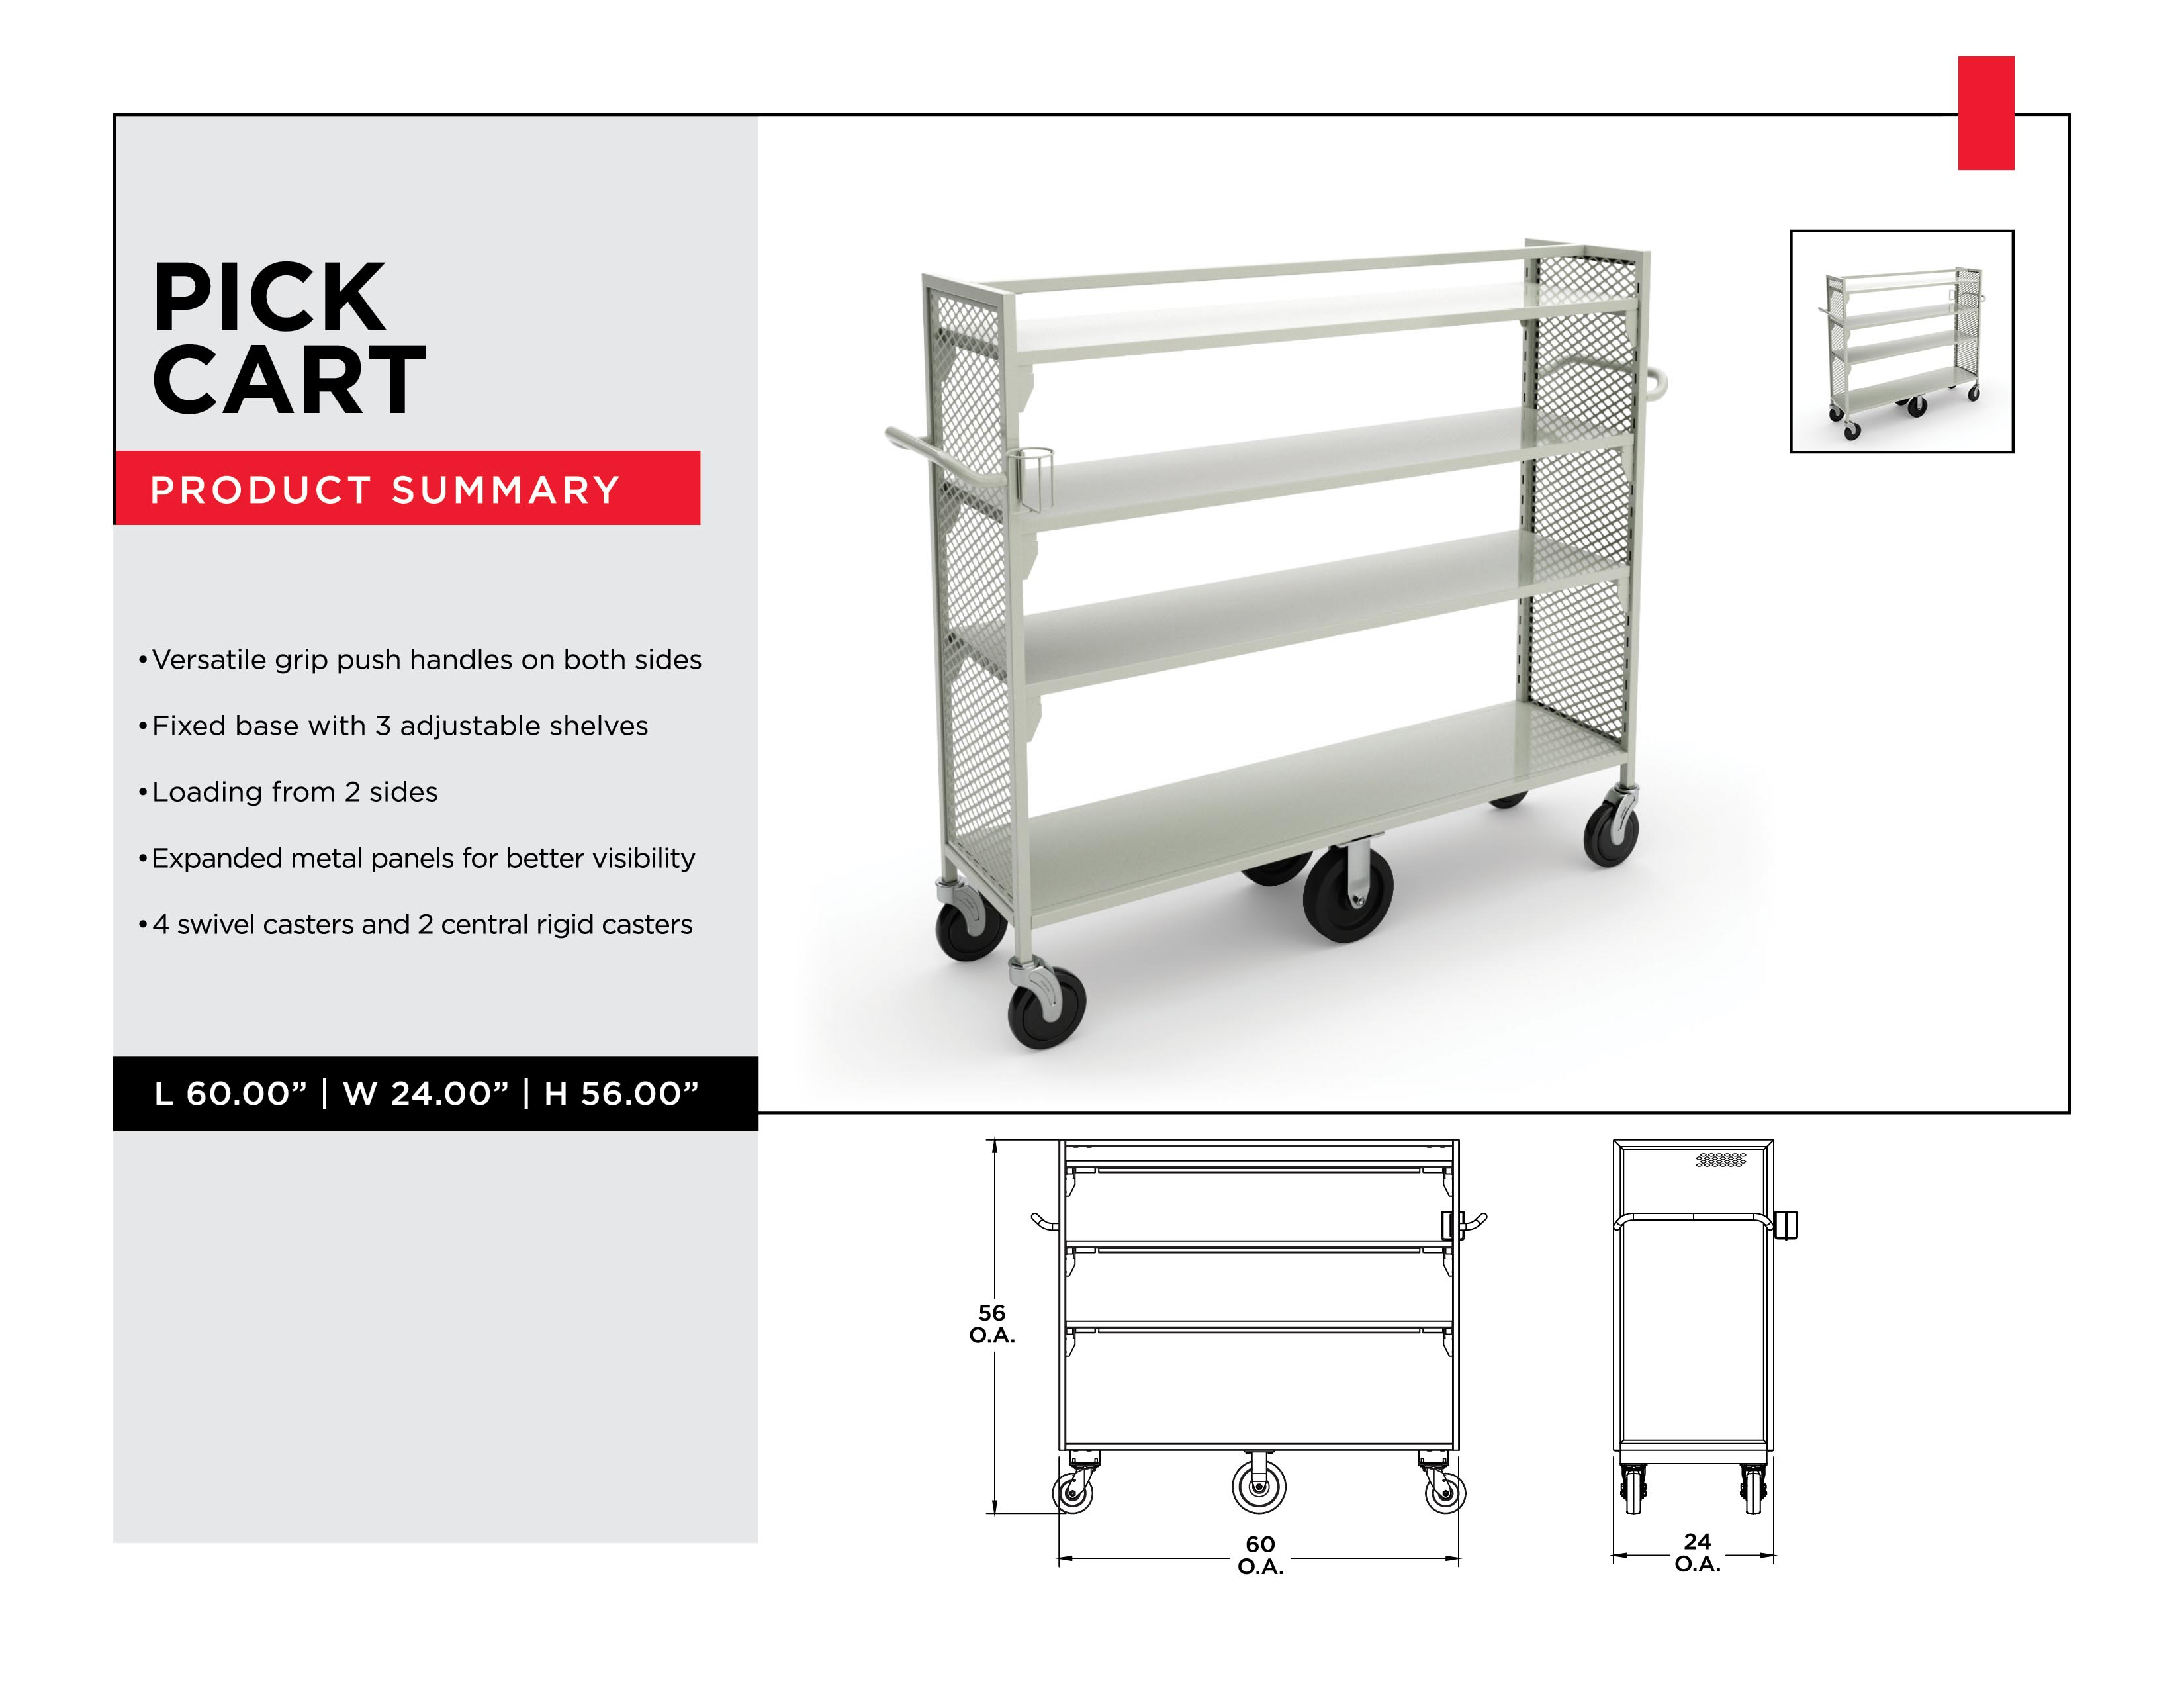 Retail Inventory Management: Pick Cart